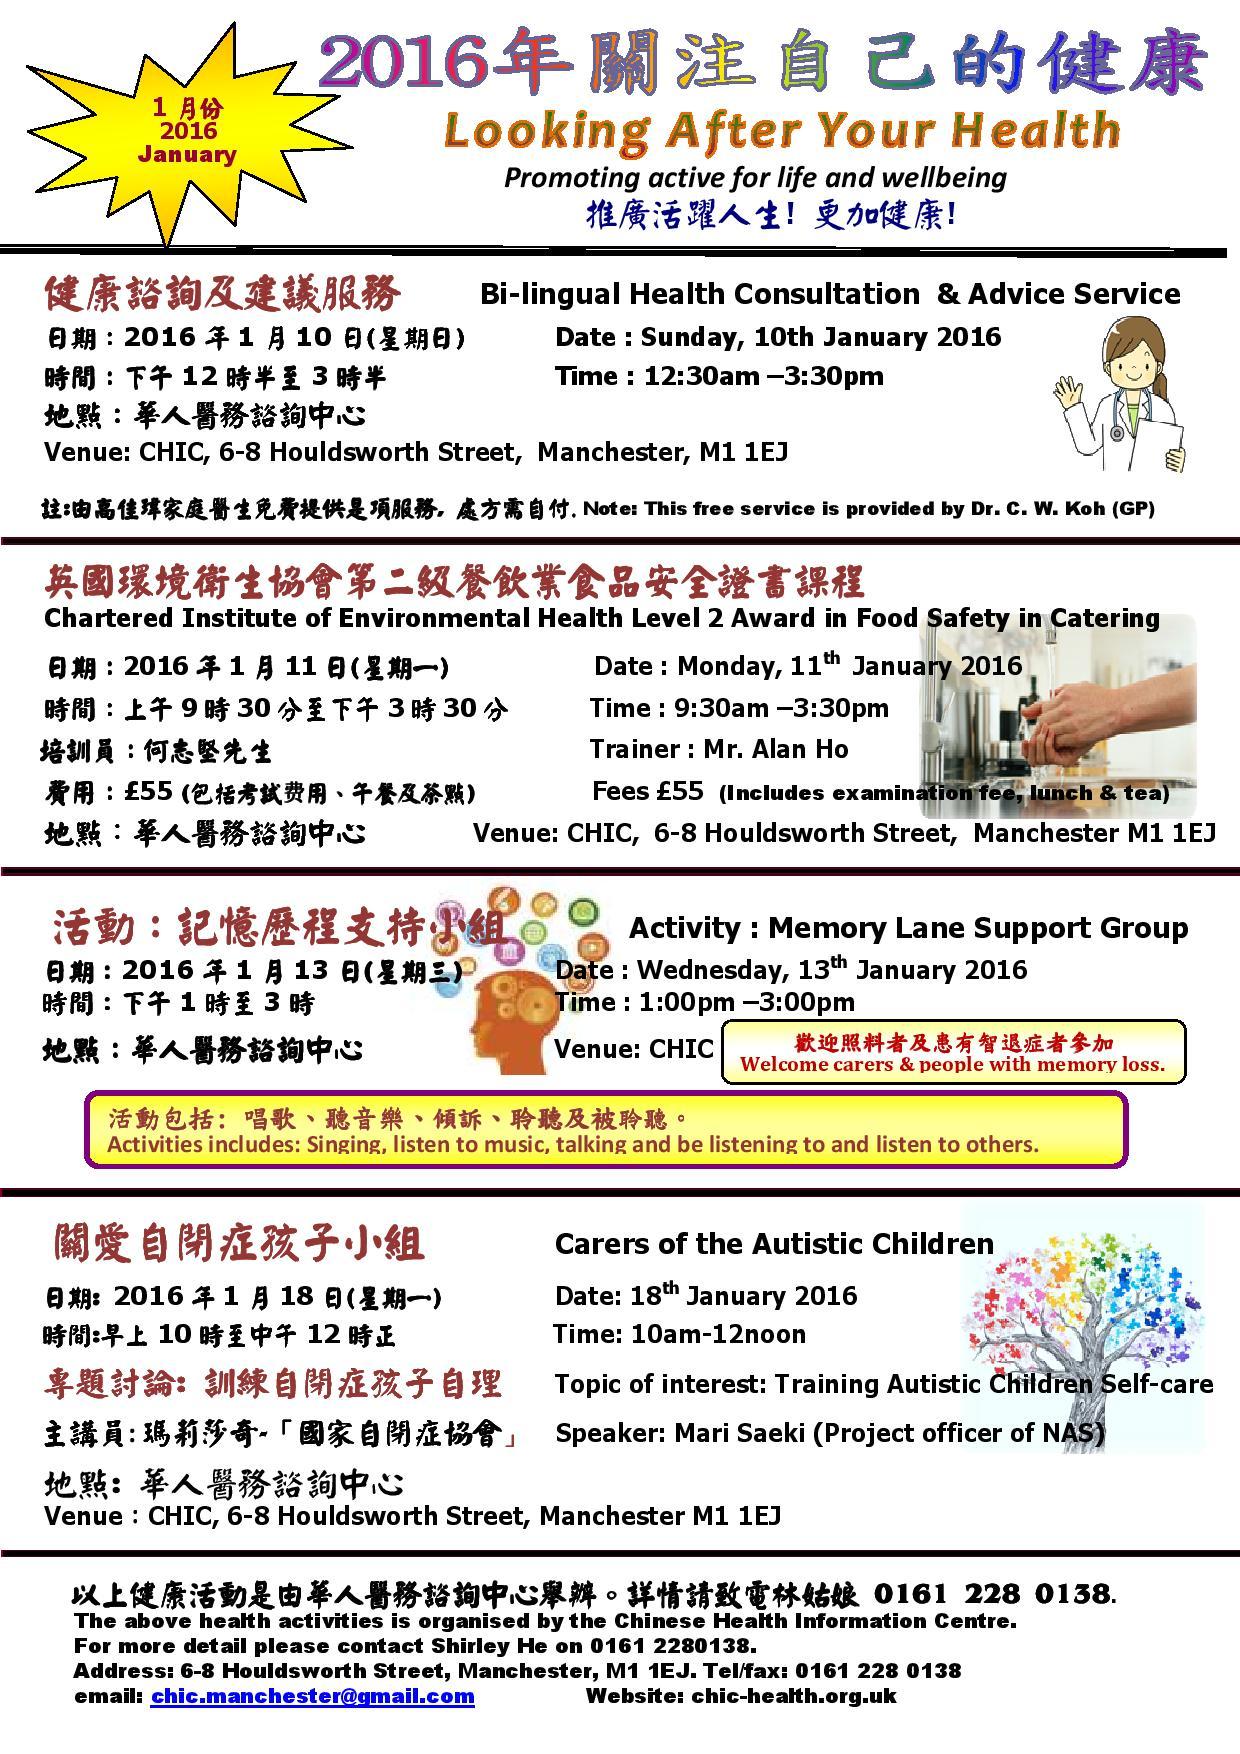 January 2016 Health Programme